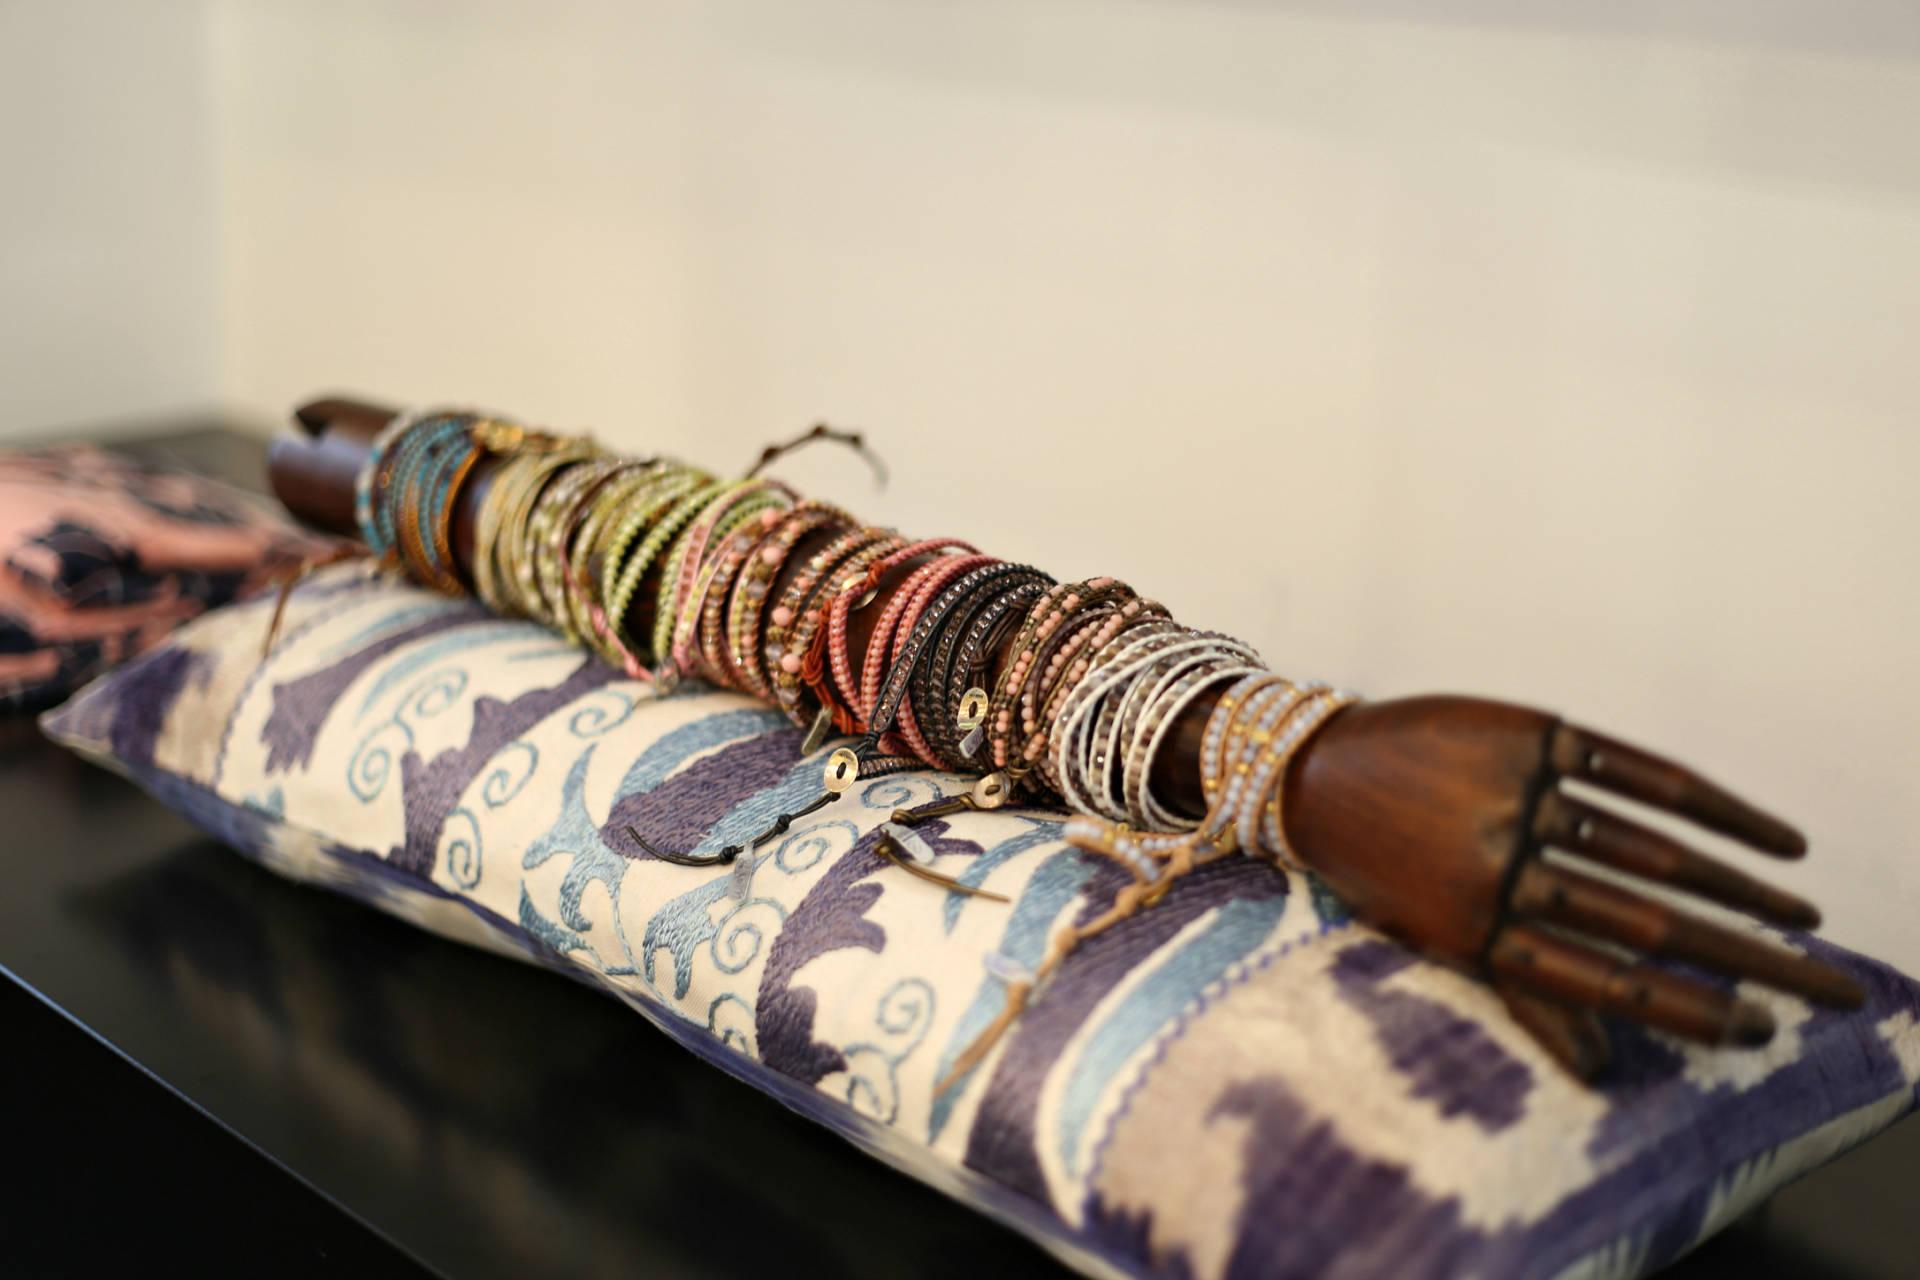 connaught villagesummer festival kokoro bracelets